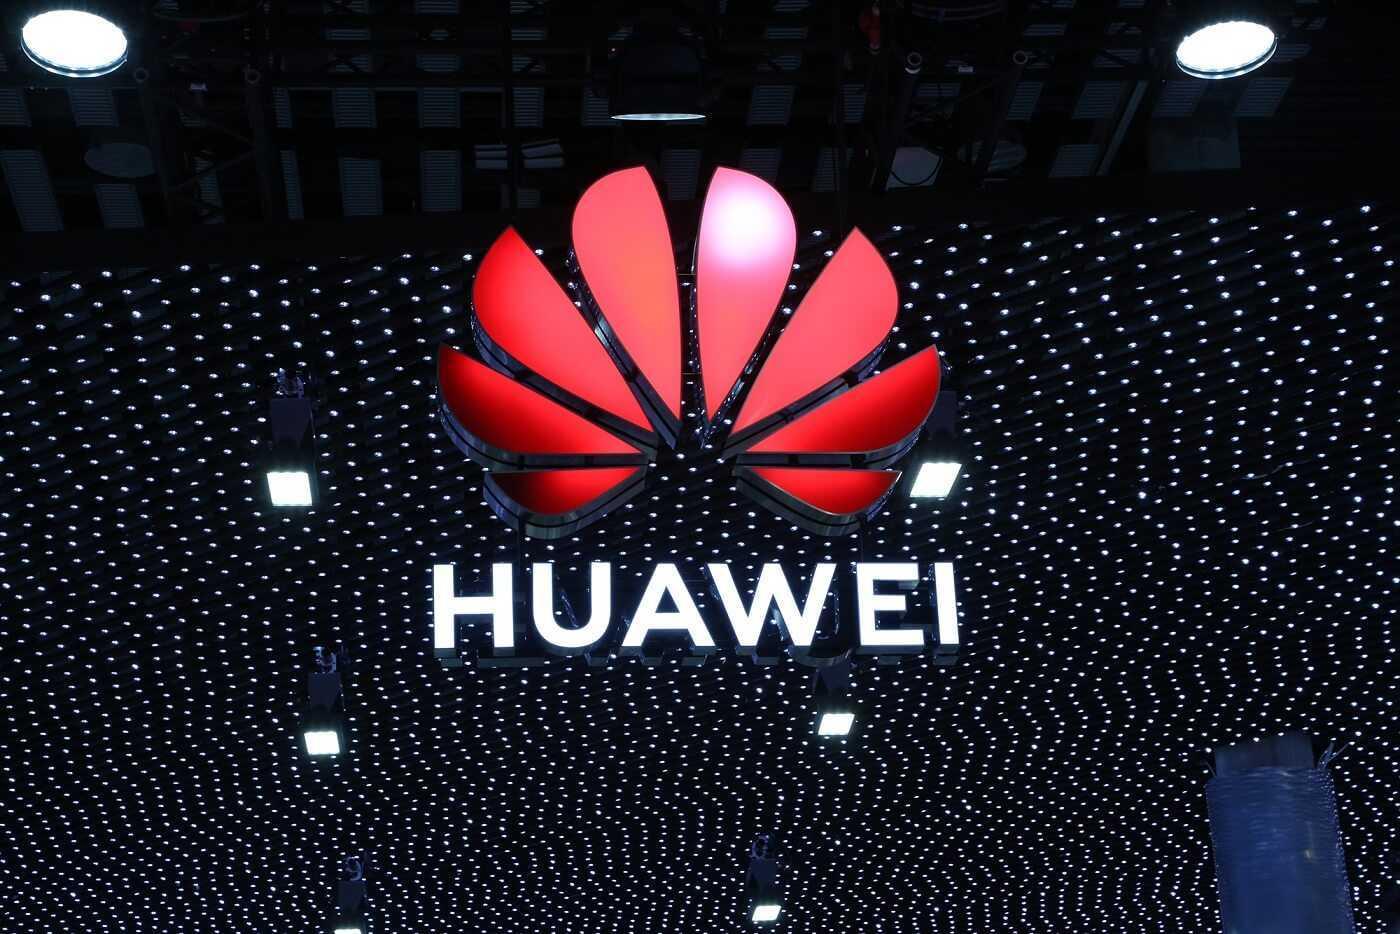 Huawei pirmo tris ceturksnu ienemumi